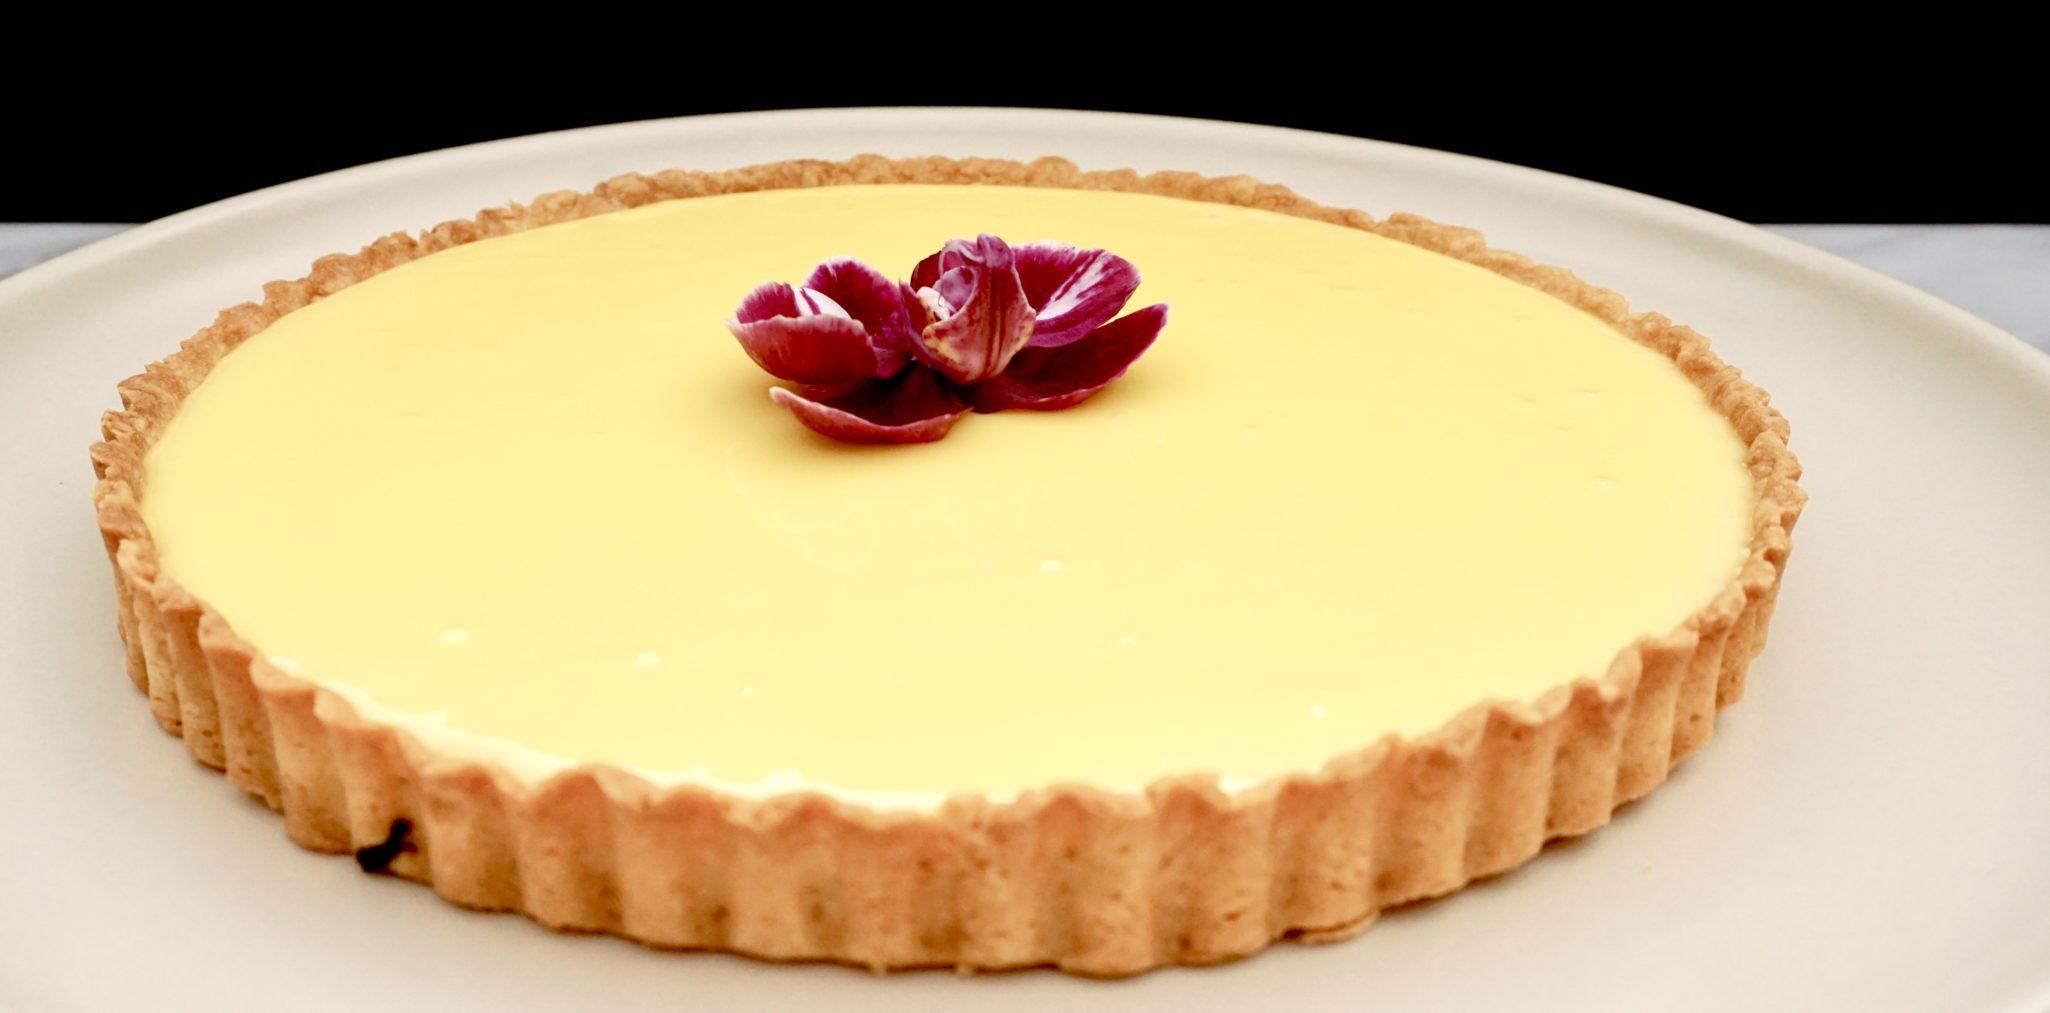 Tartine's Lemon Cream Tart  P-Squared, Pie Perfection